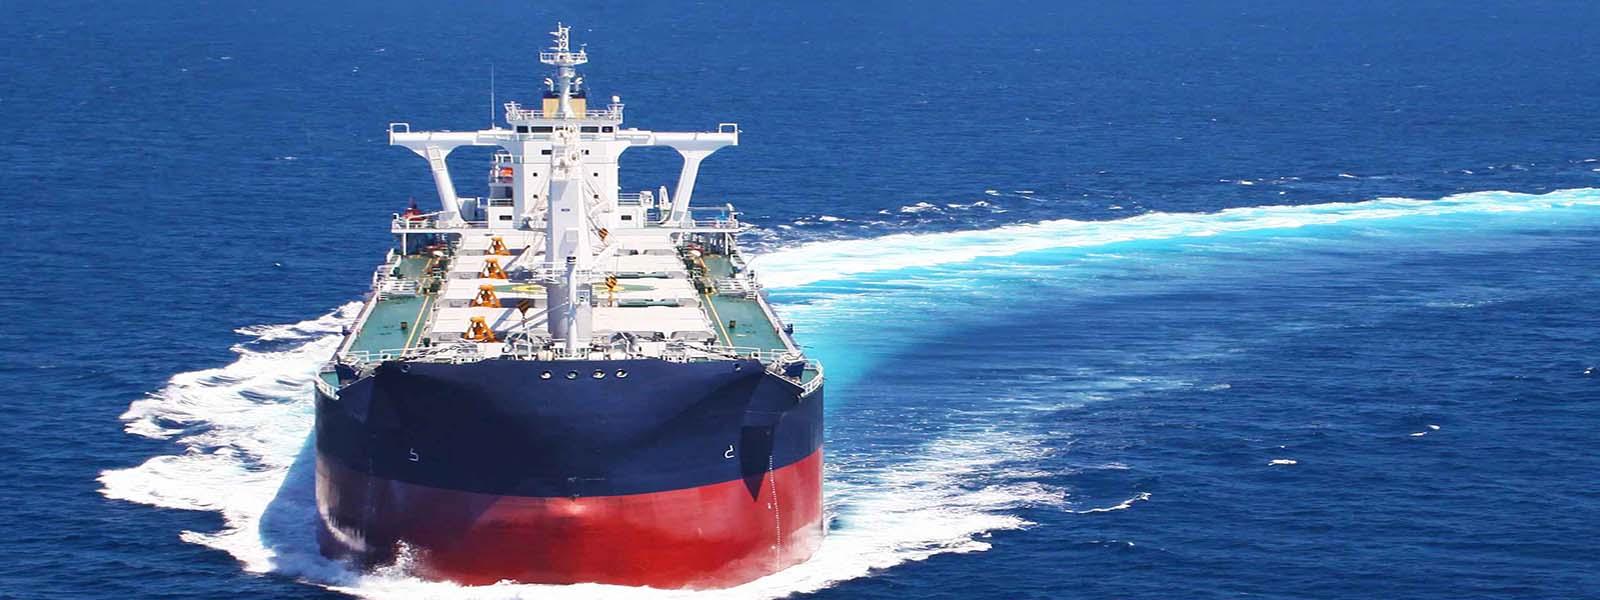 Gregale Dry Bulk Shipping